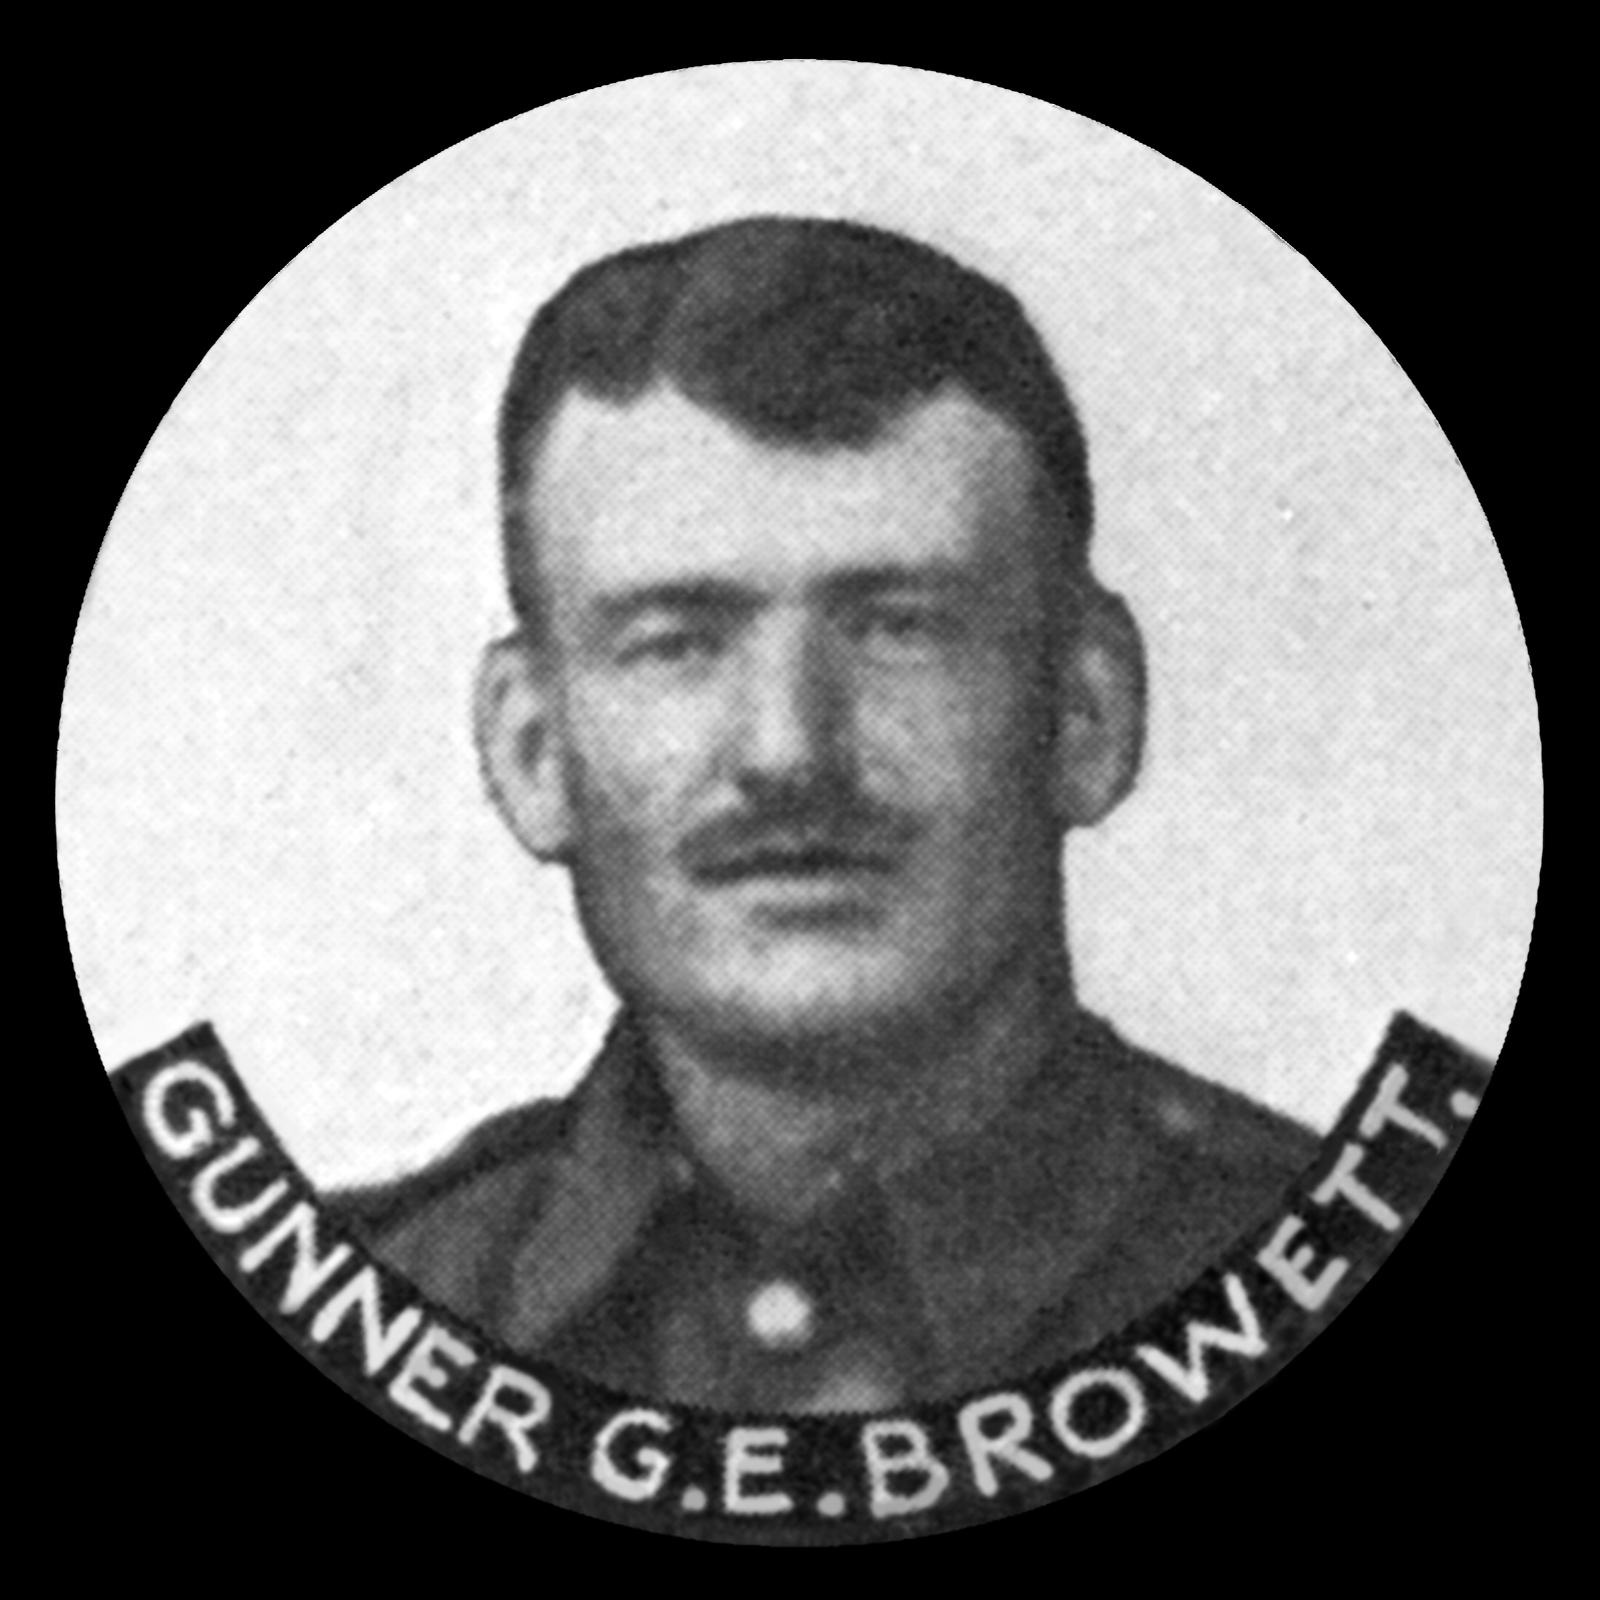 BROWETT George Edward